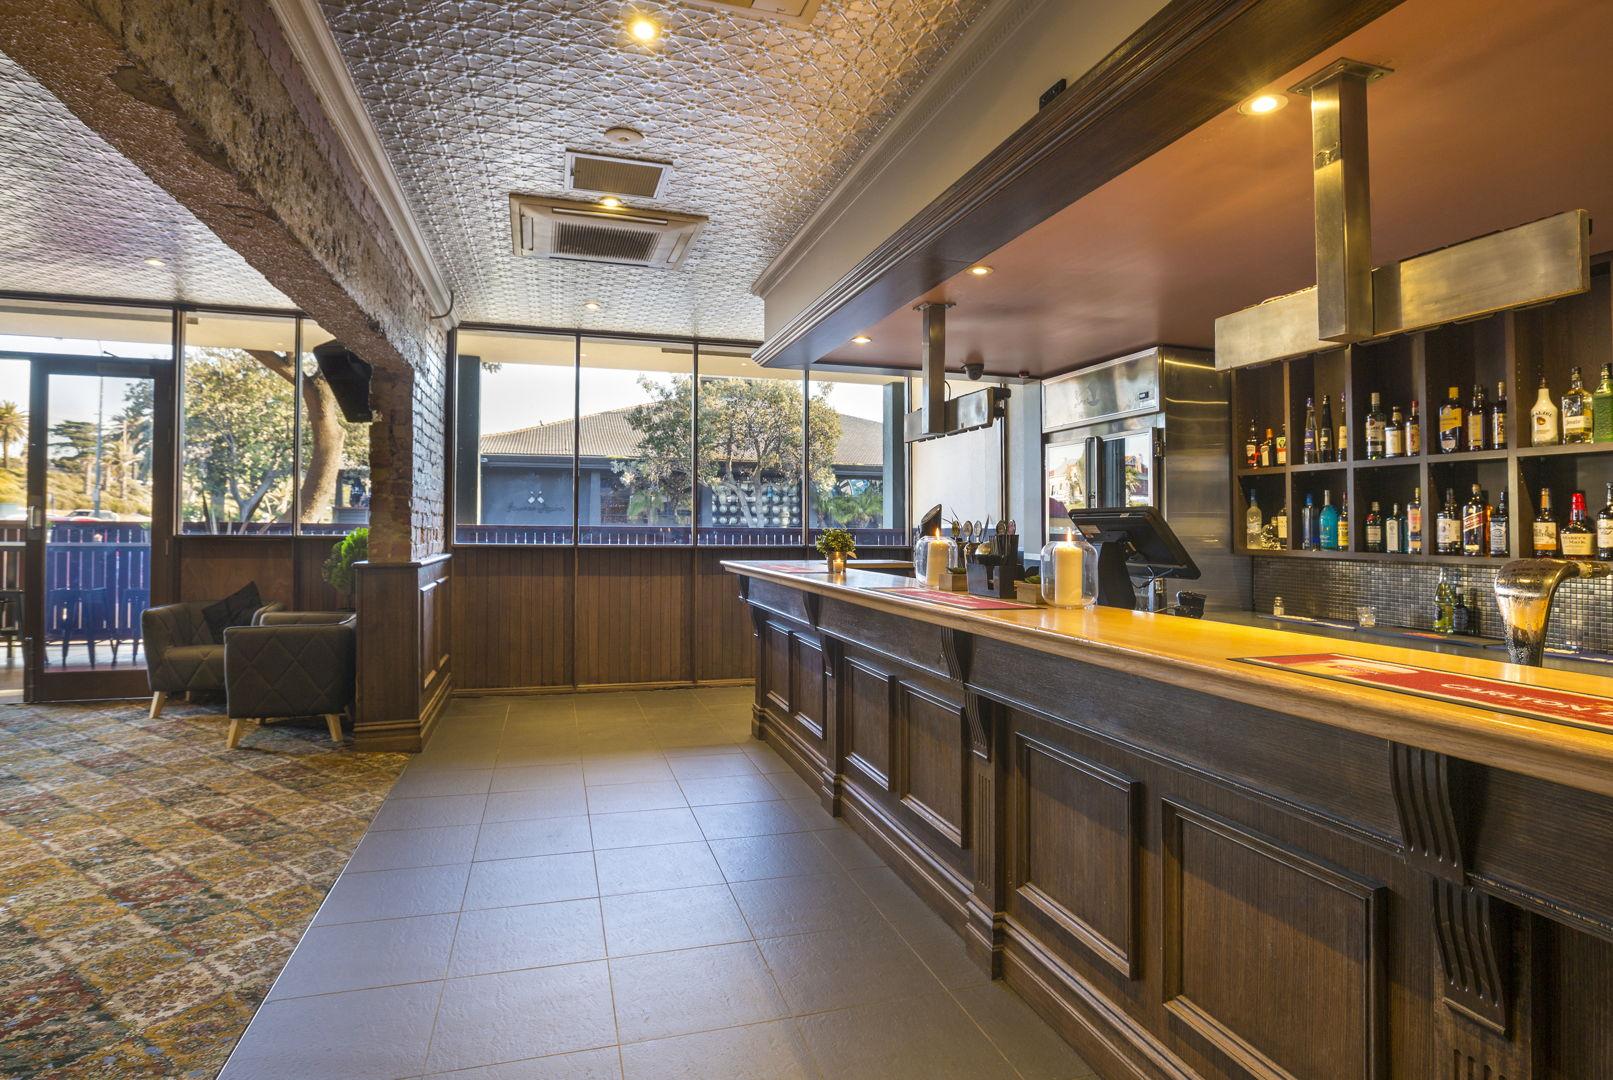 pier-hotel-flanagans-irish-bar (2).jpg